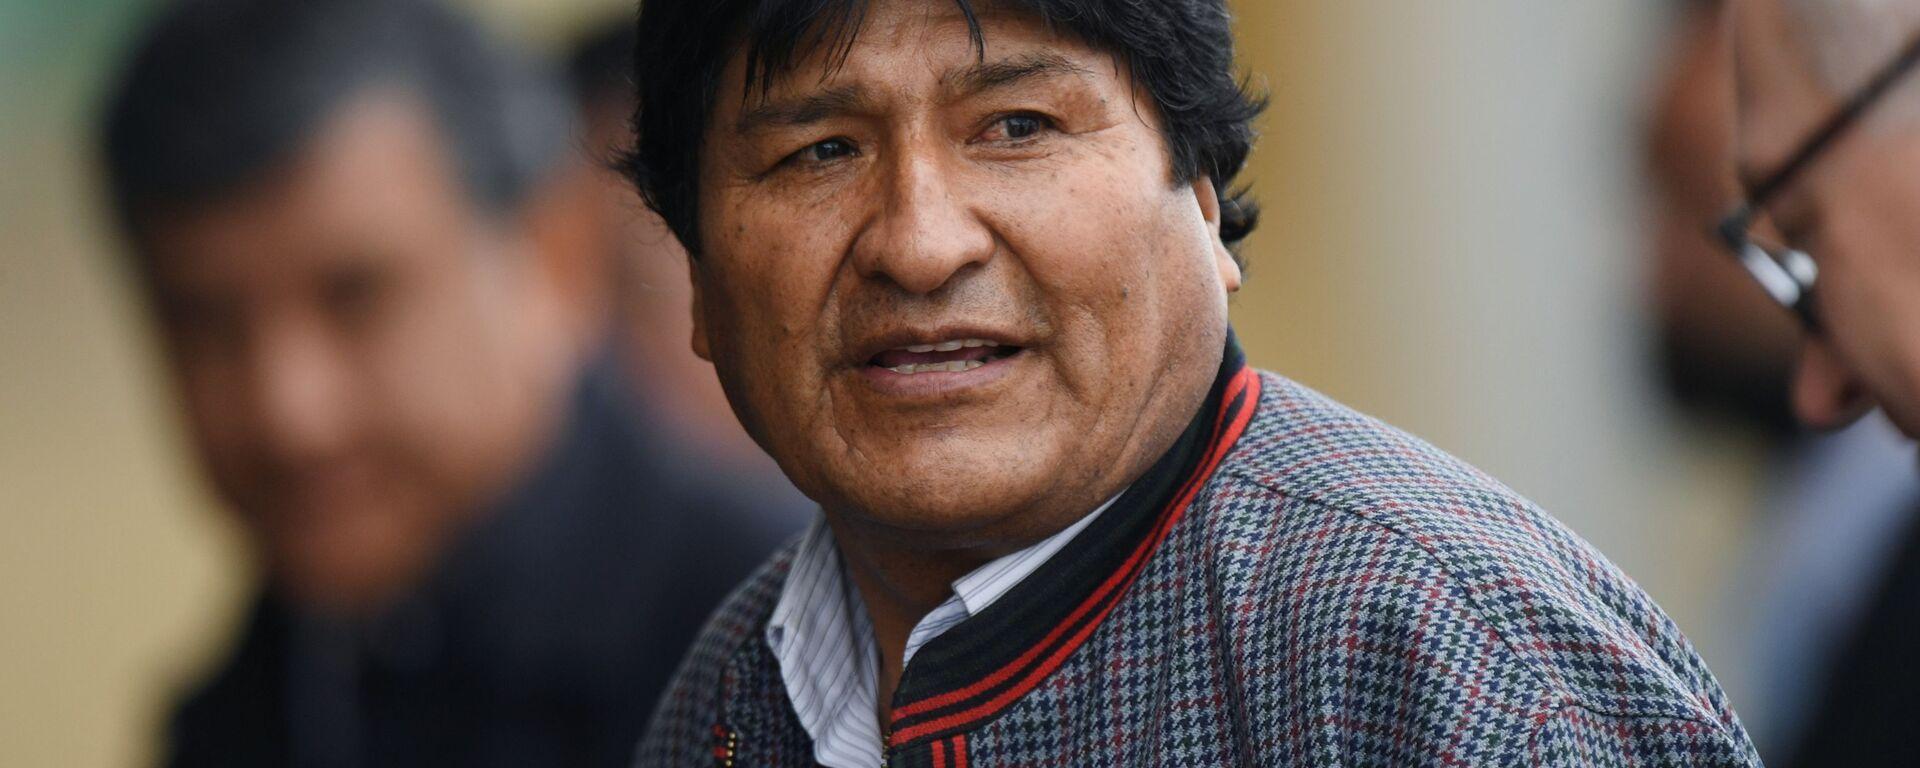 Evo Morales, presidente boliviano  - Sputnik Mundo, 1920, 26.04.2021